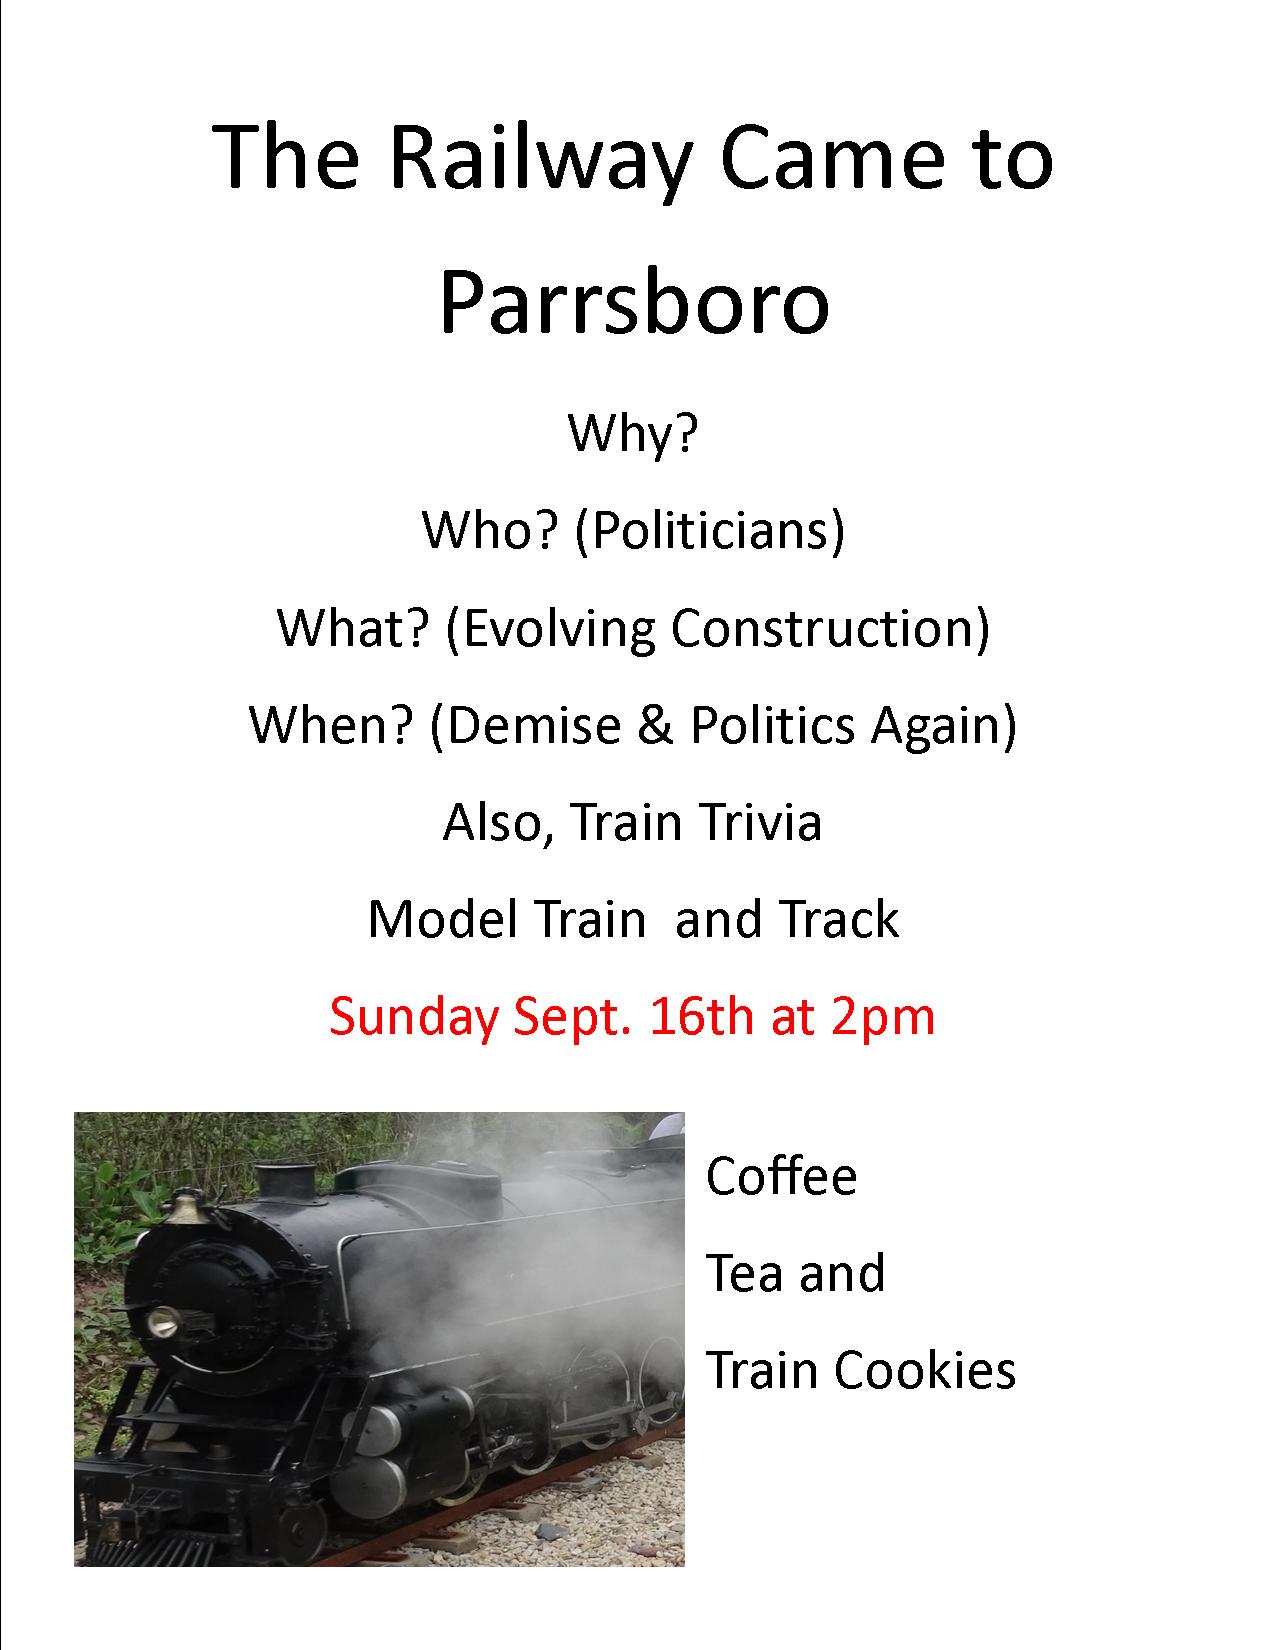 The Train Came to Parrsboro